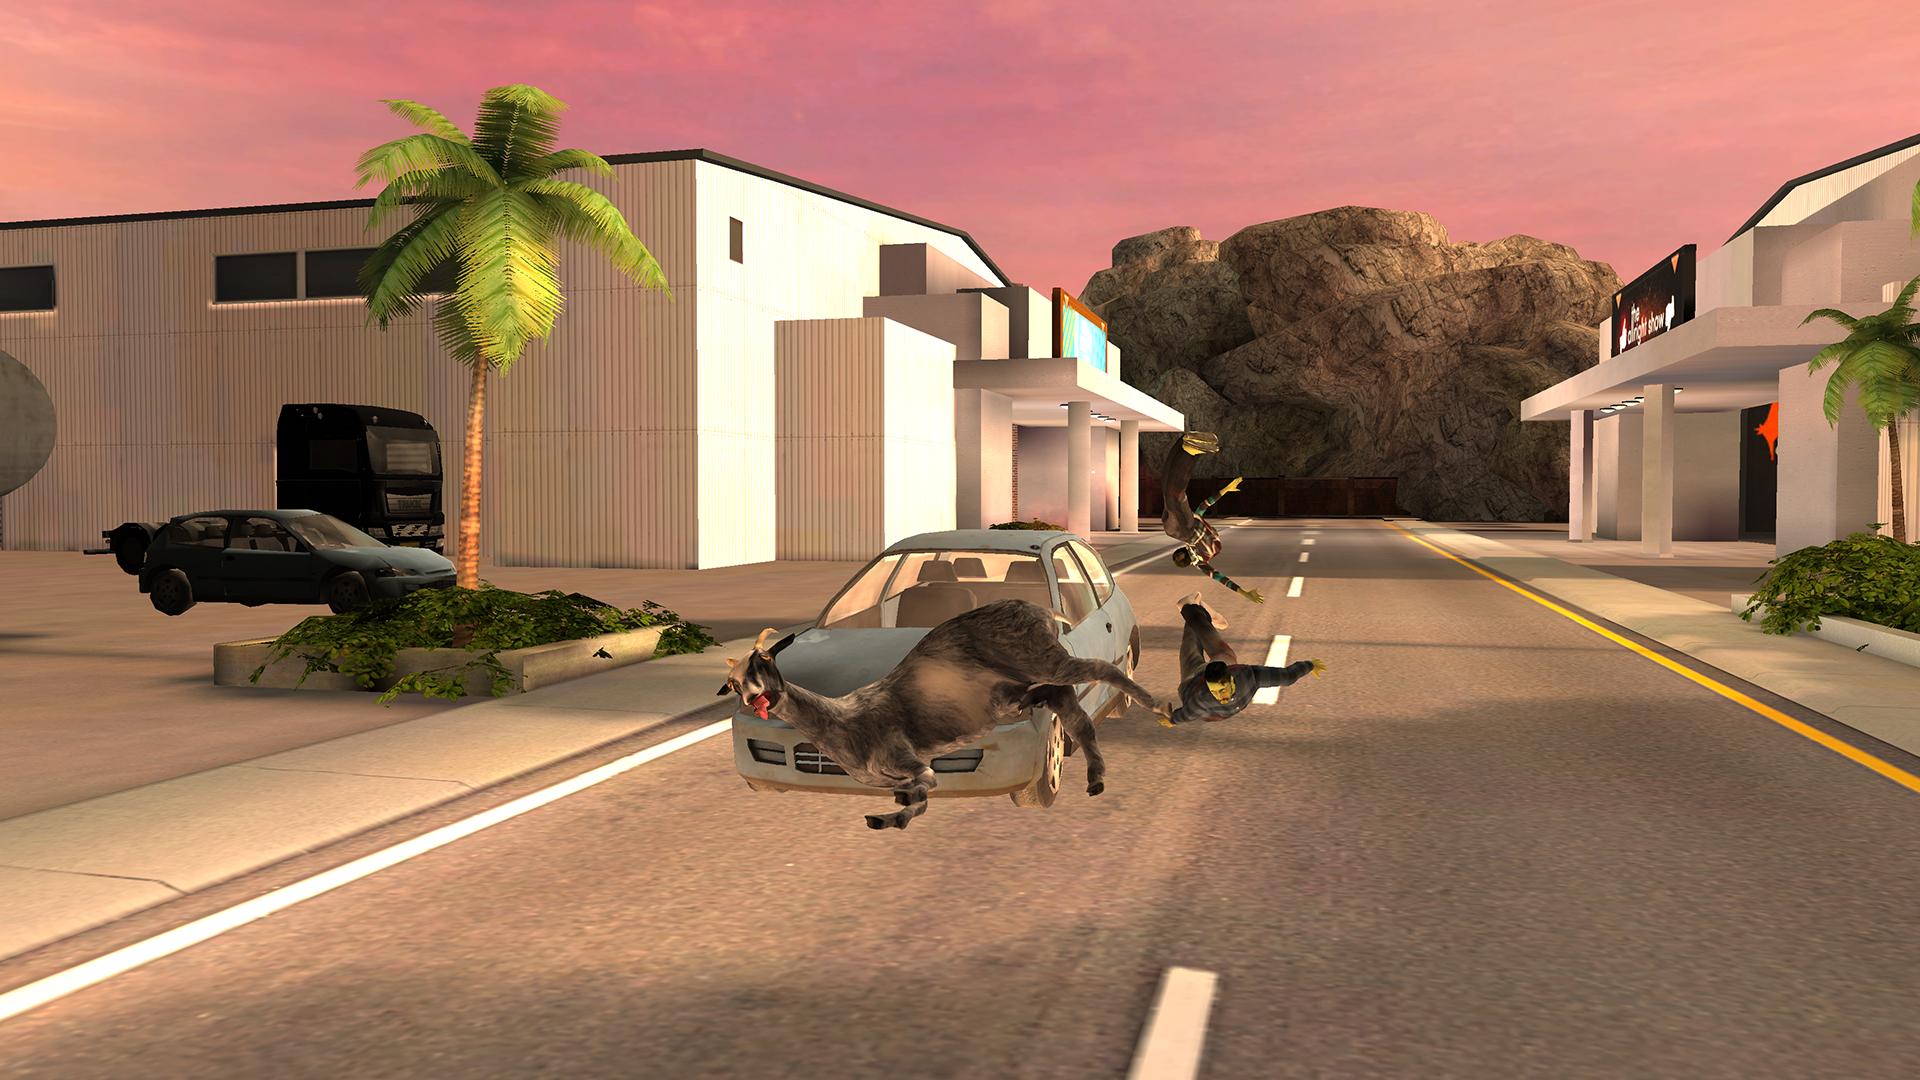 Amazon.com: Goat Simulator GoatZ: Appstore for Android